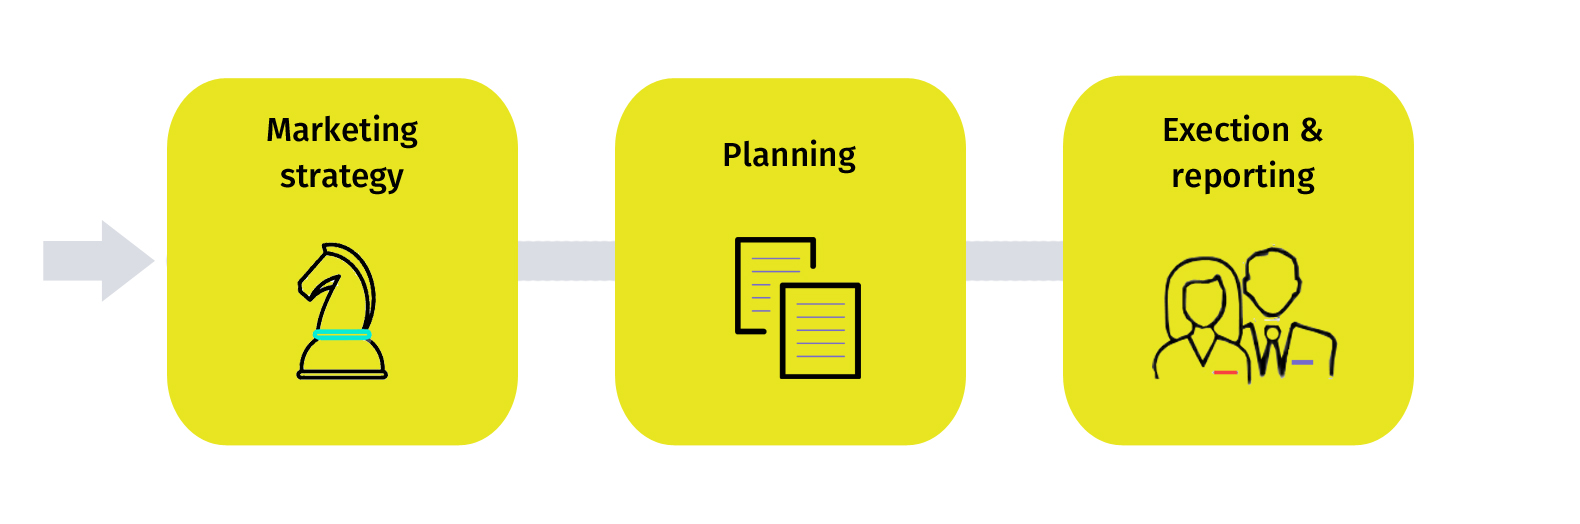 services pg graphic - strat - plan- exec copy.jpg